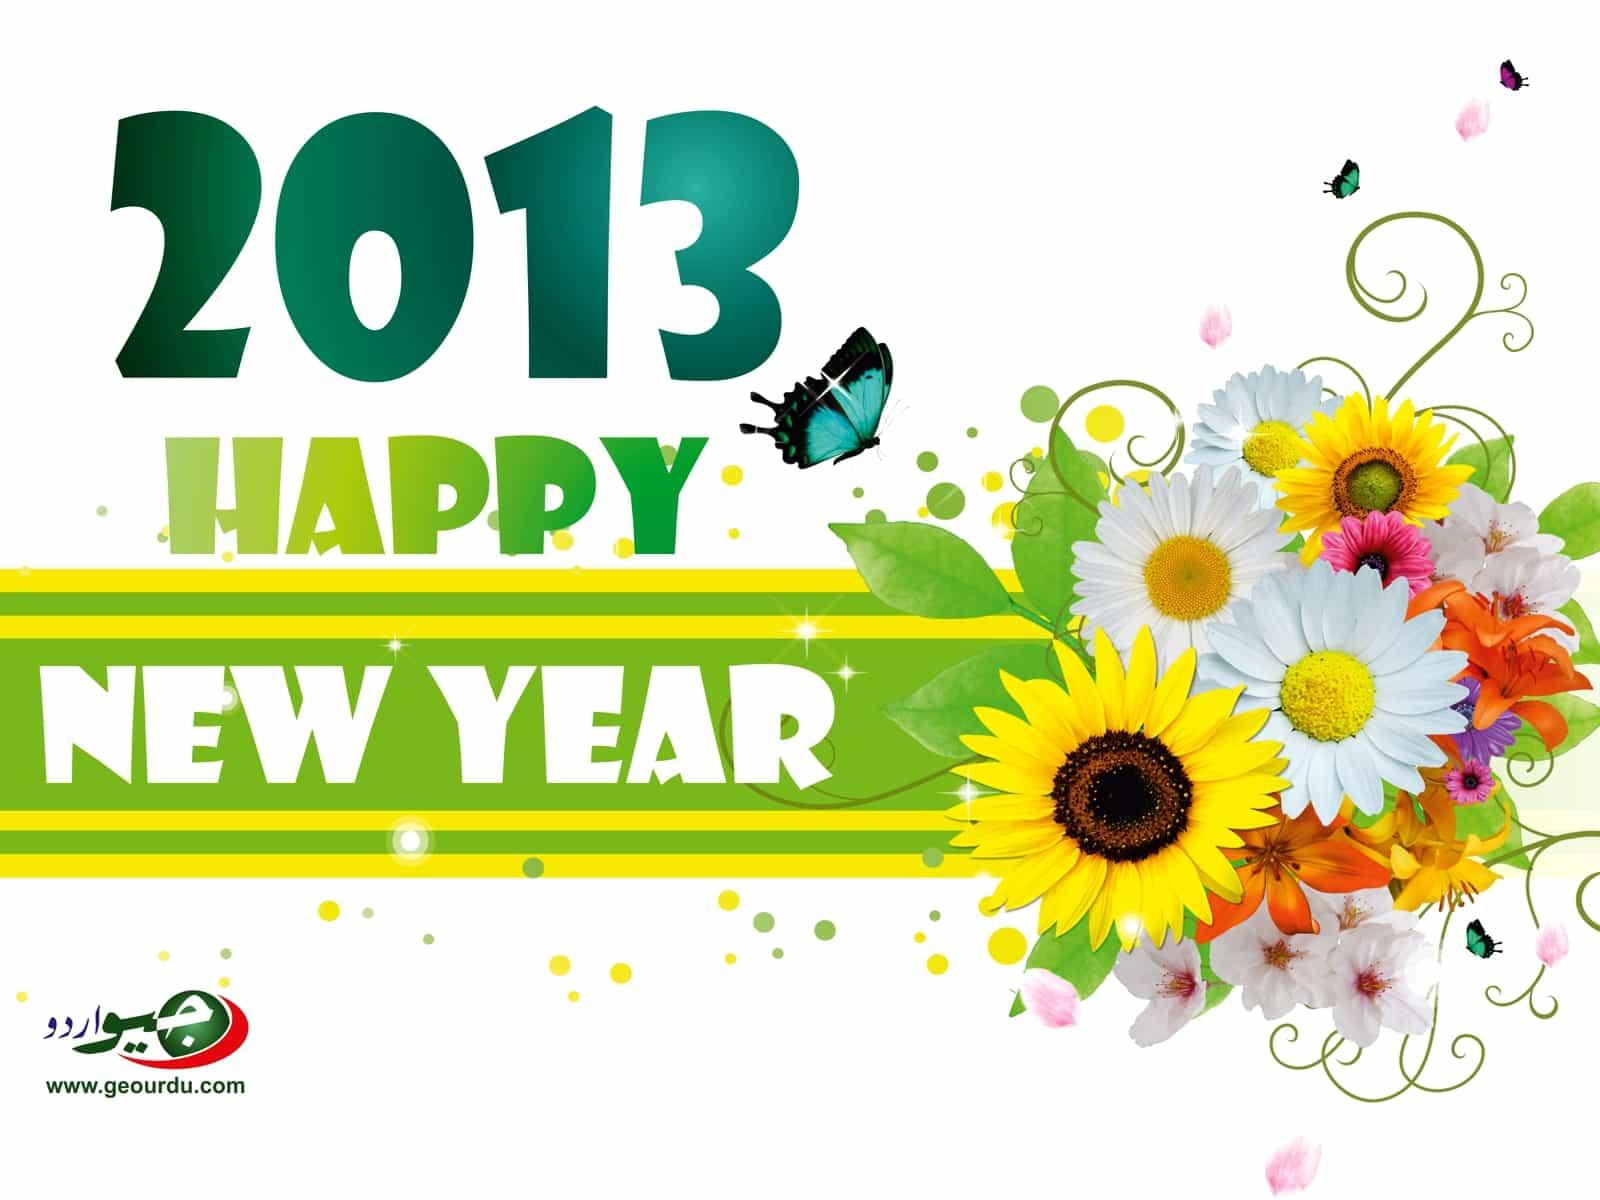 Happy-New-Year-2013-01